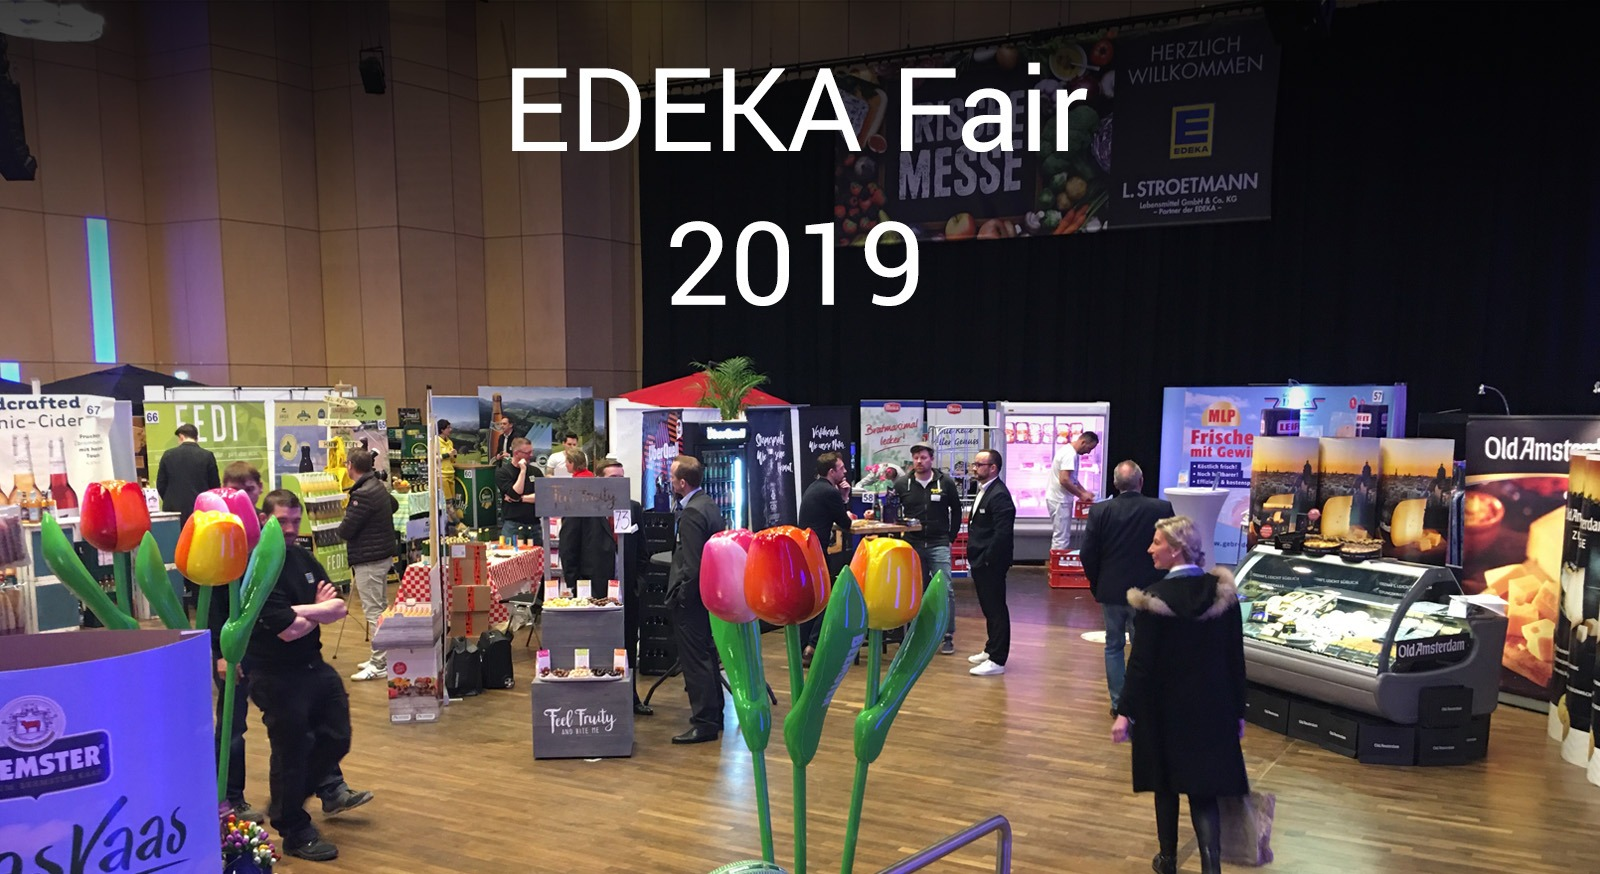 edeka messe 2019